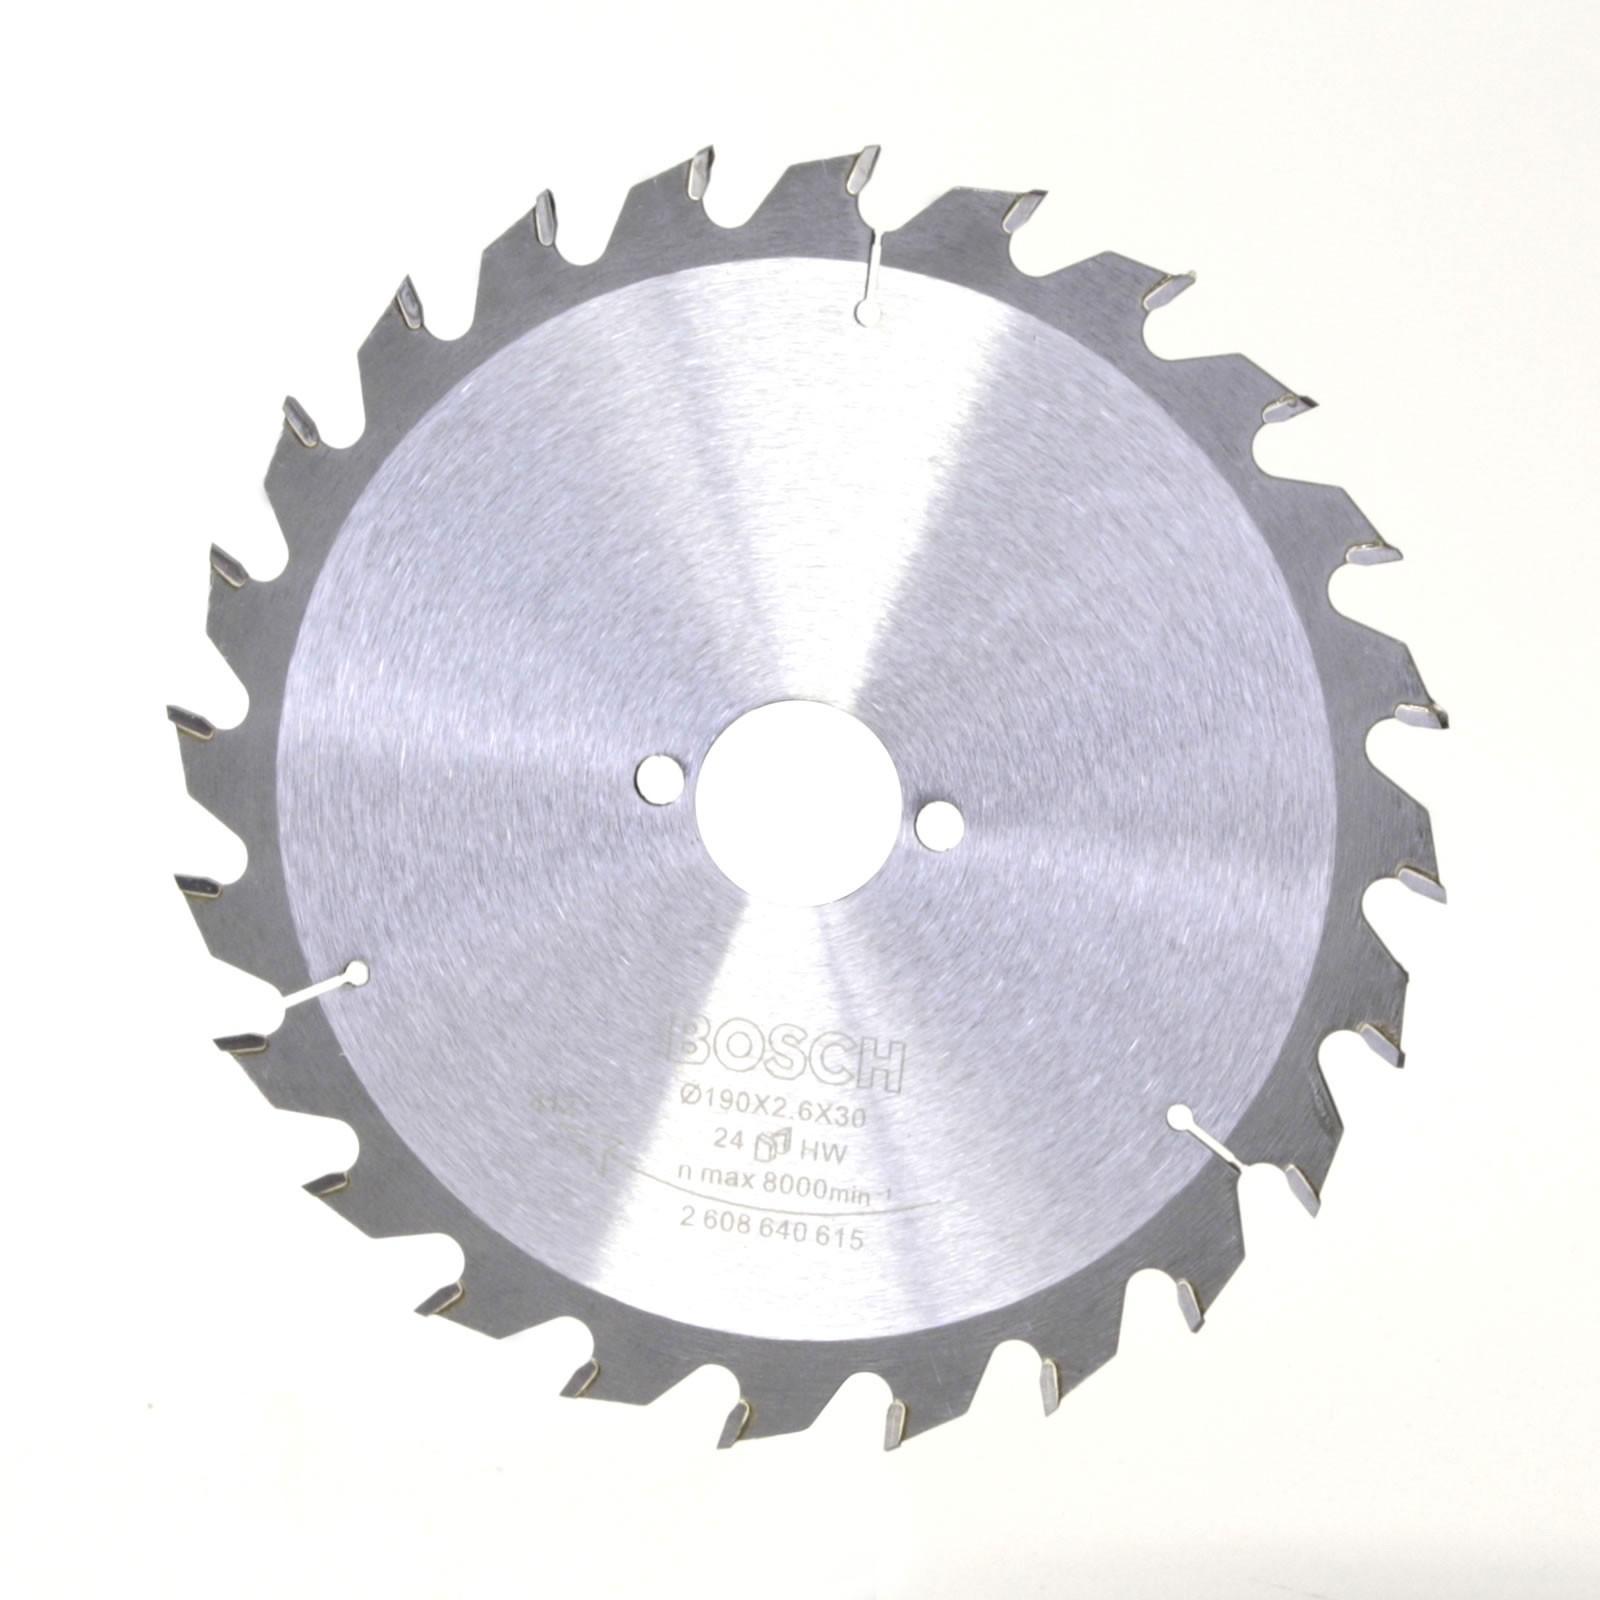 bosch sägeblatt für handkreissäge 190x30mm